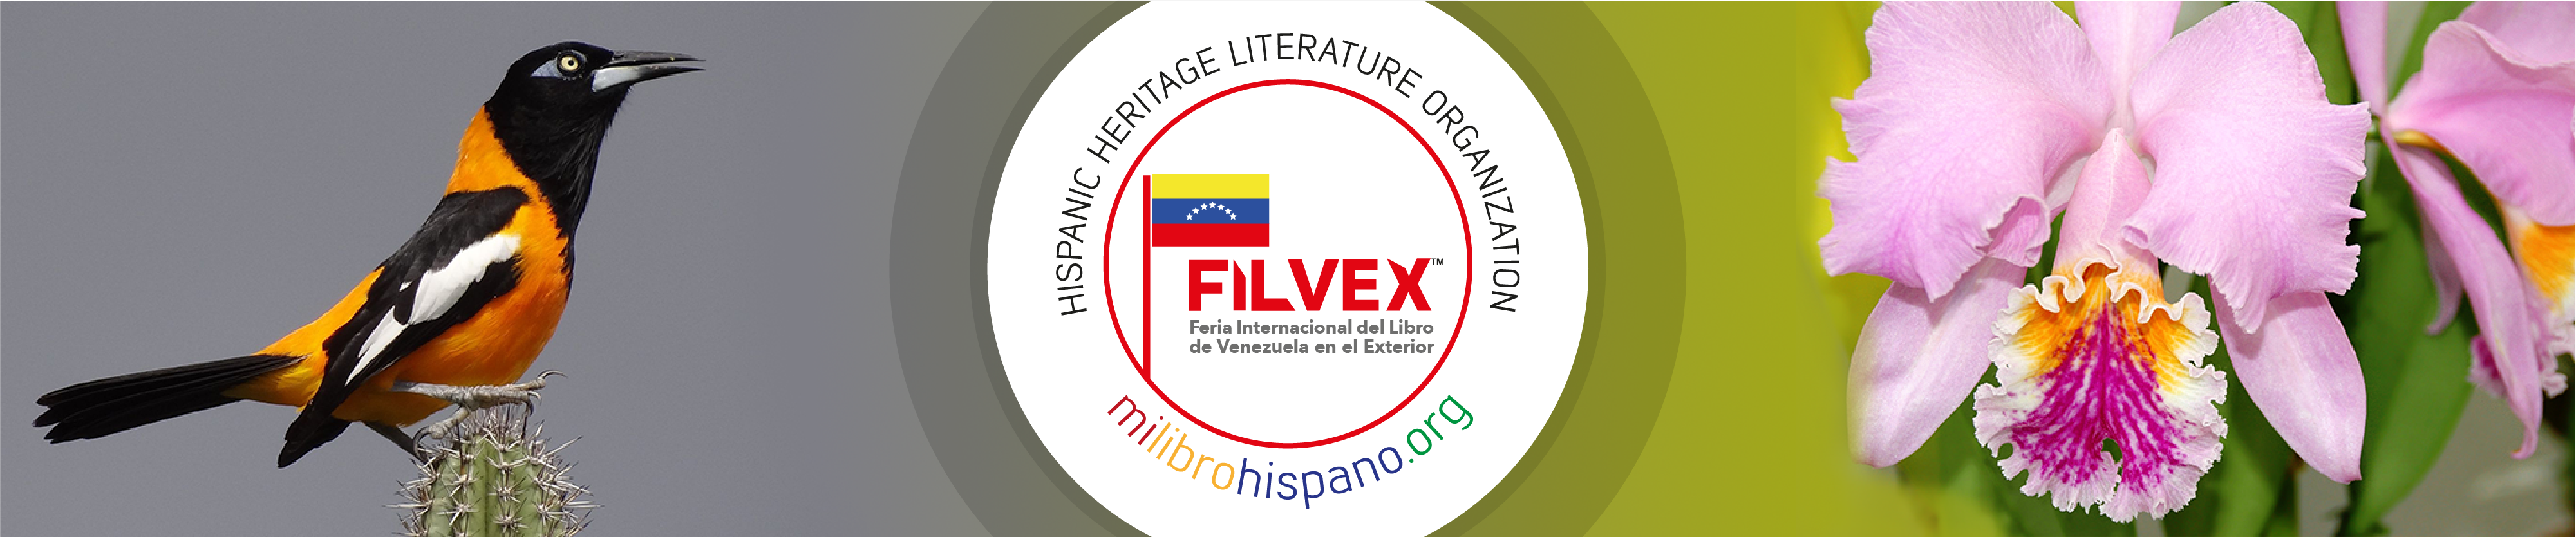 FIL Banner - Venezuela